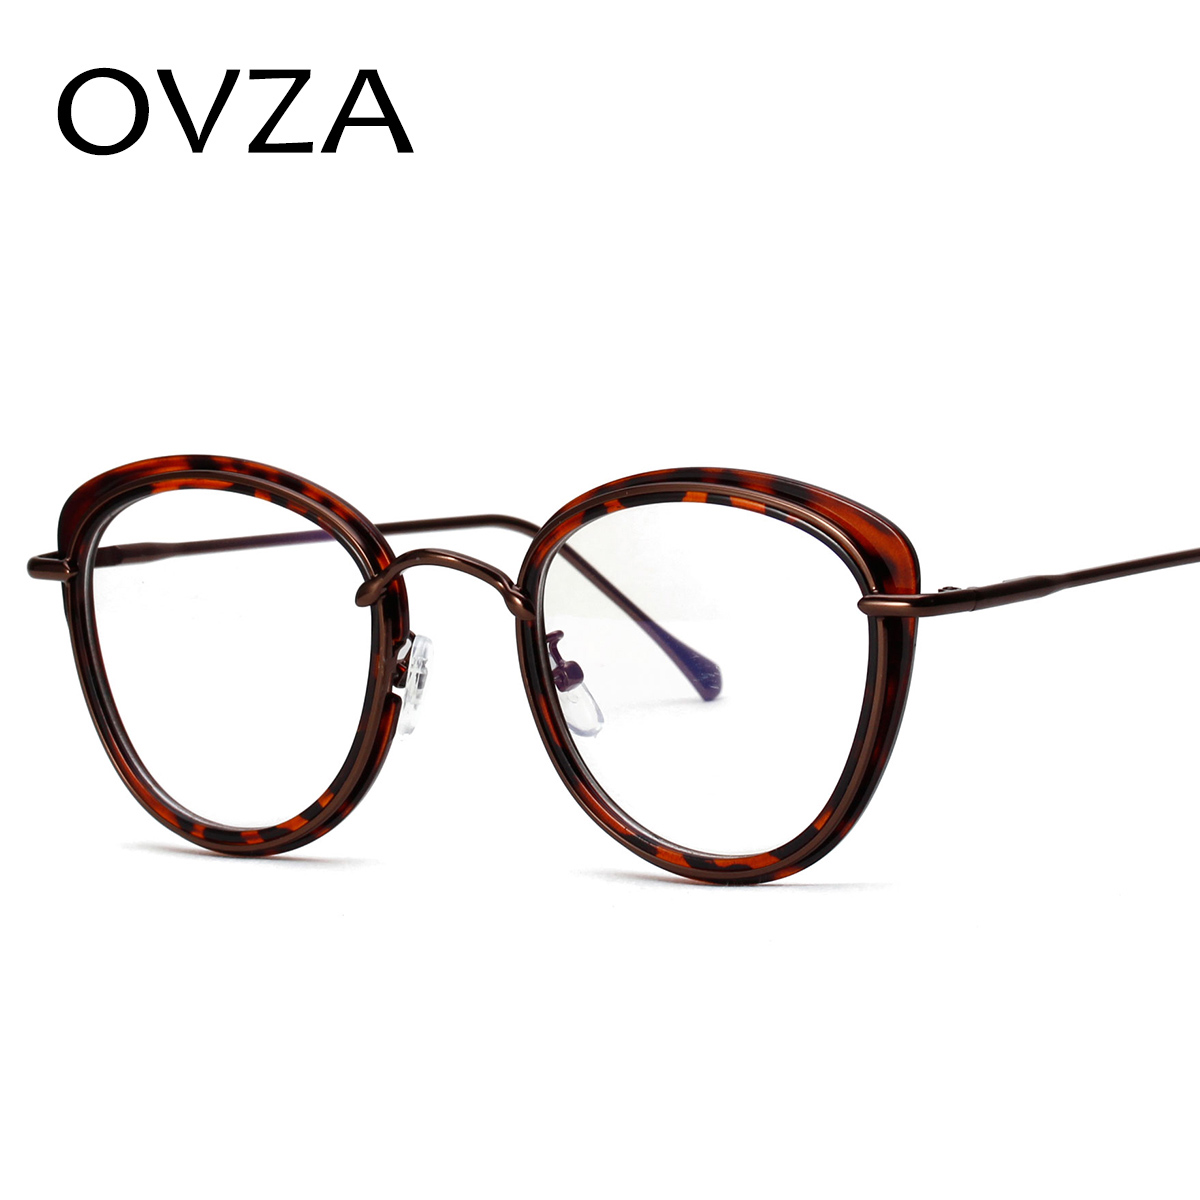 Aliexpress.com : Buy OVZA Vintage Reading Glasses Women Classic Cat ...